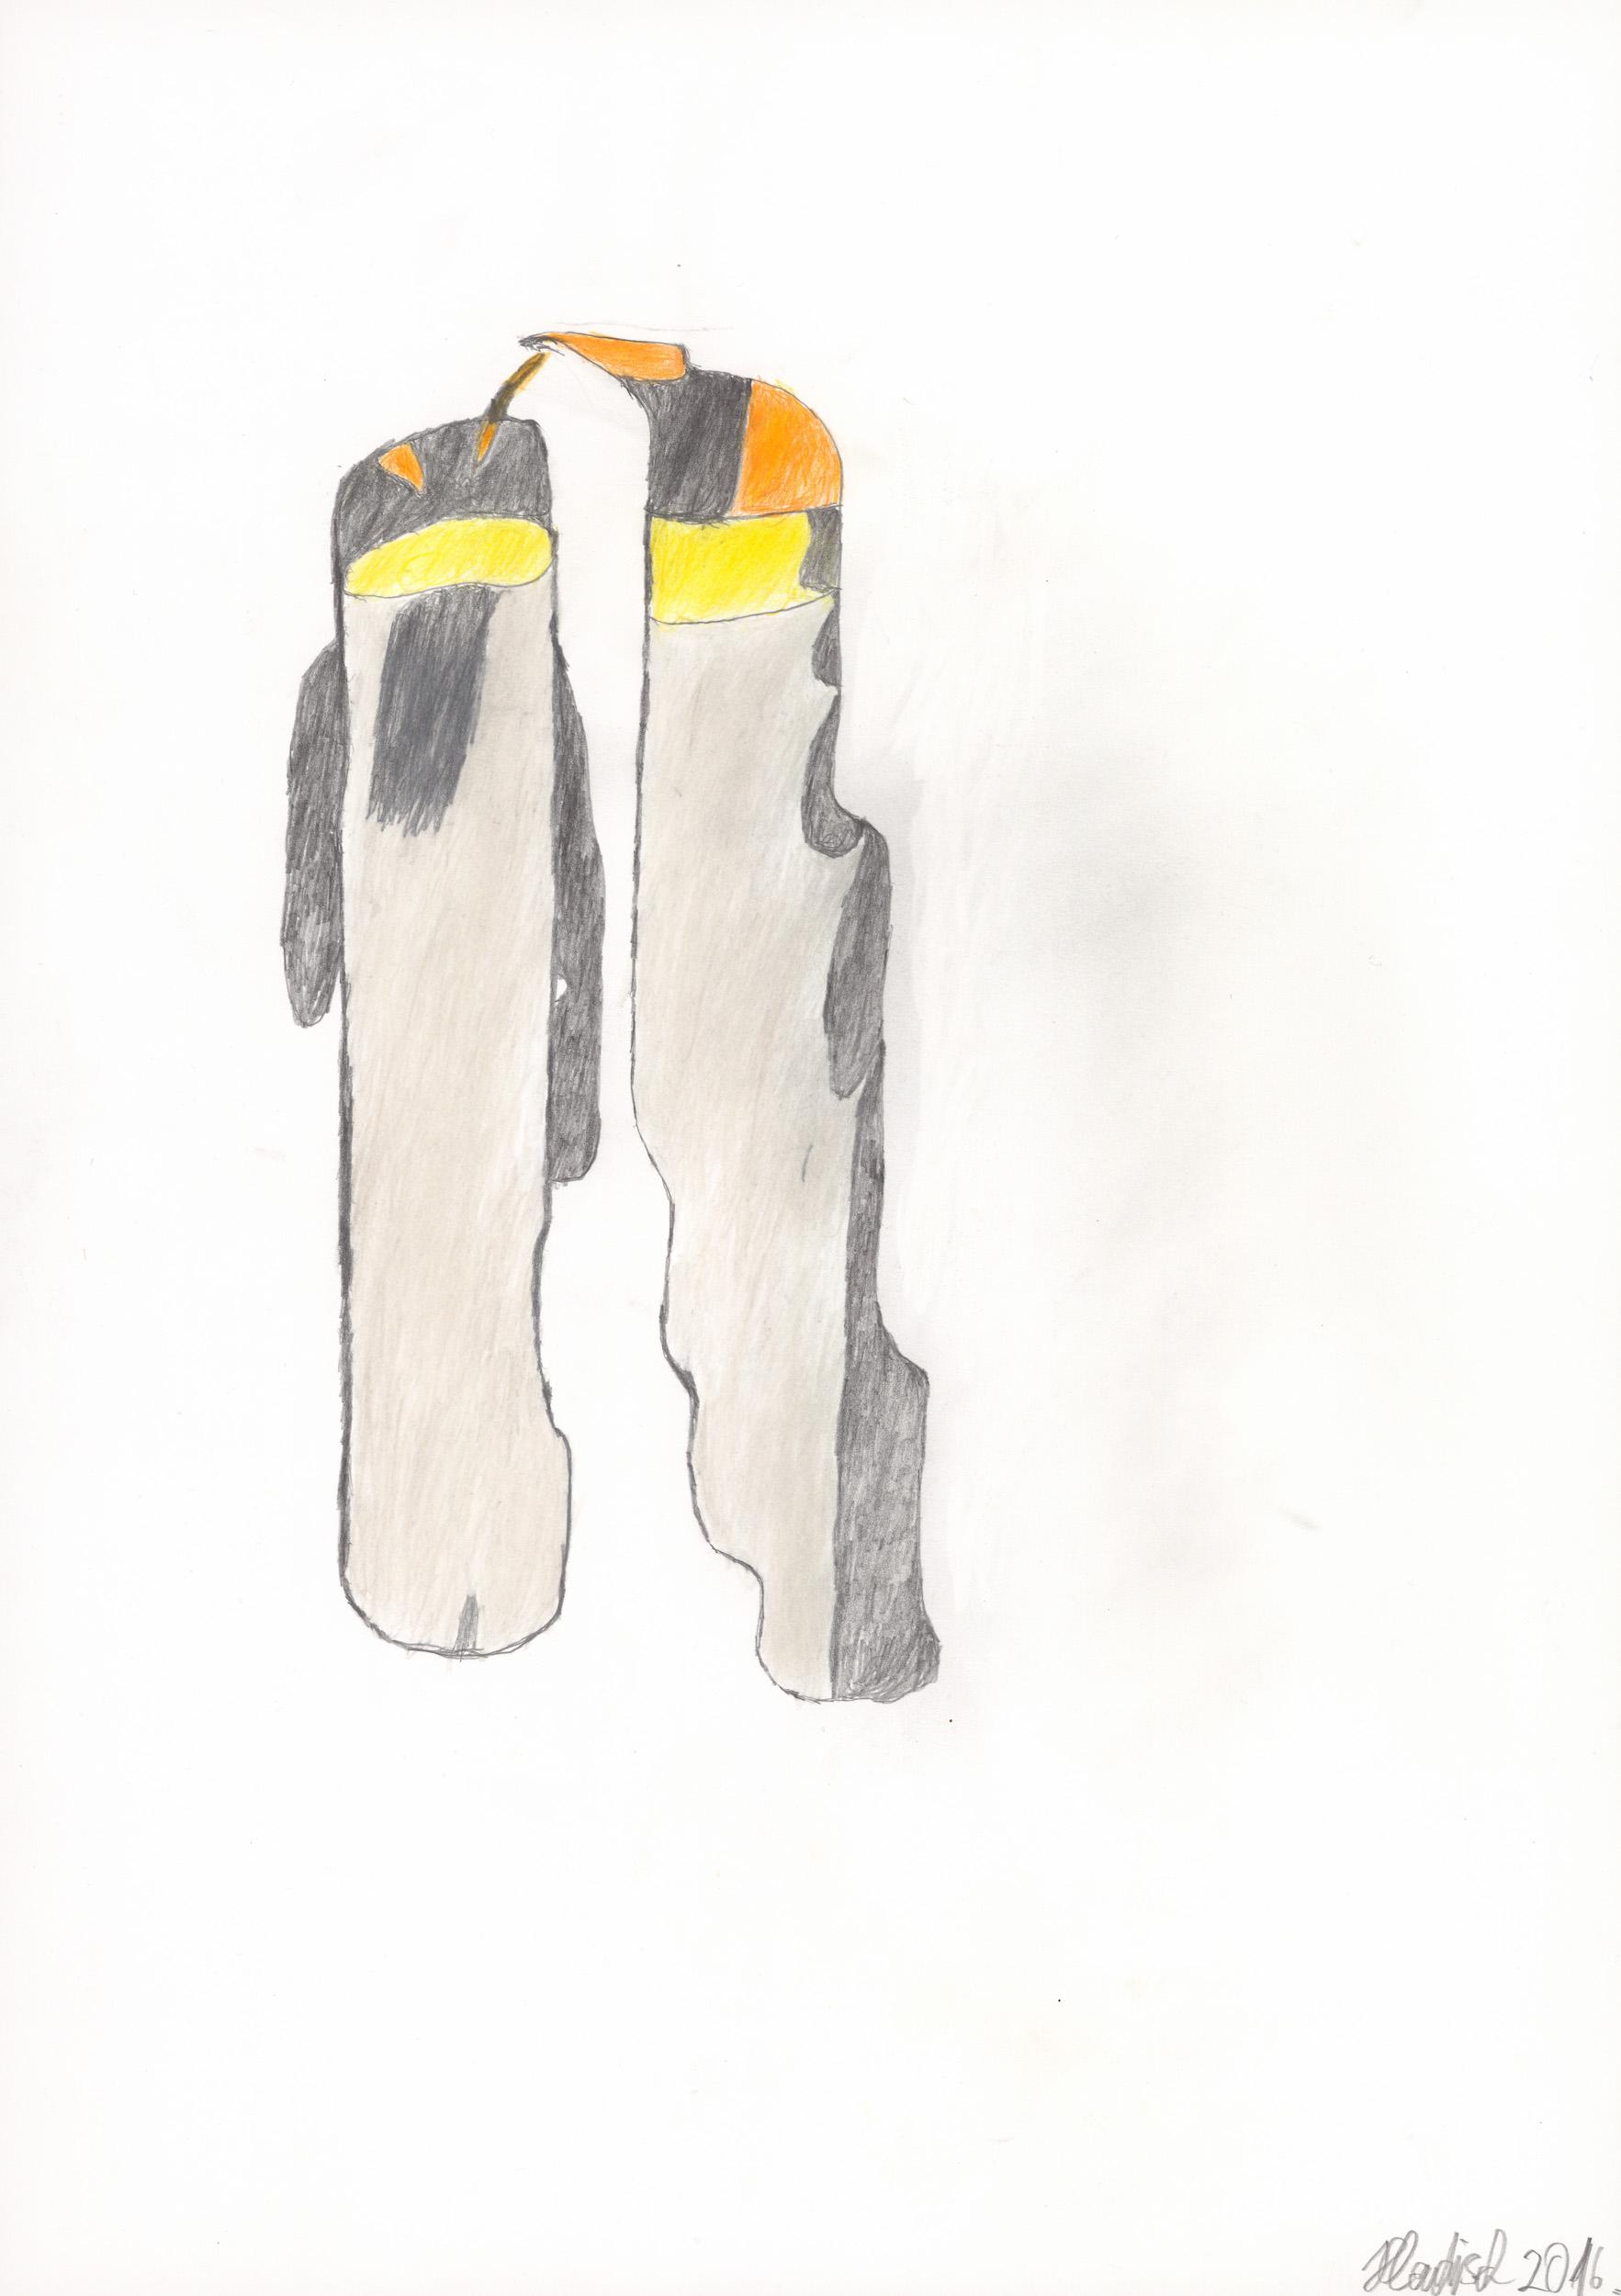 hladisch helmut - Pinguine / Penguins